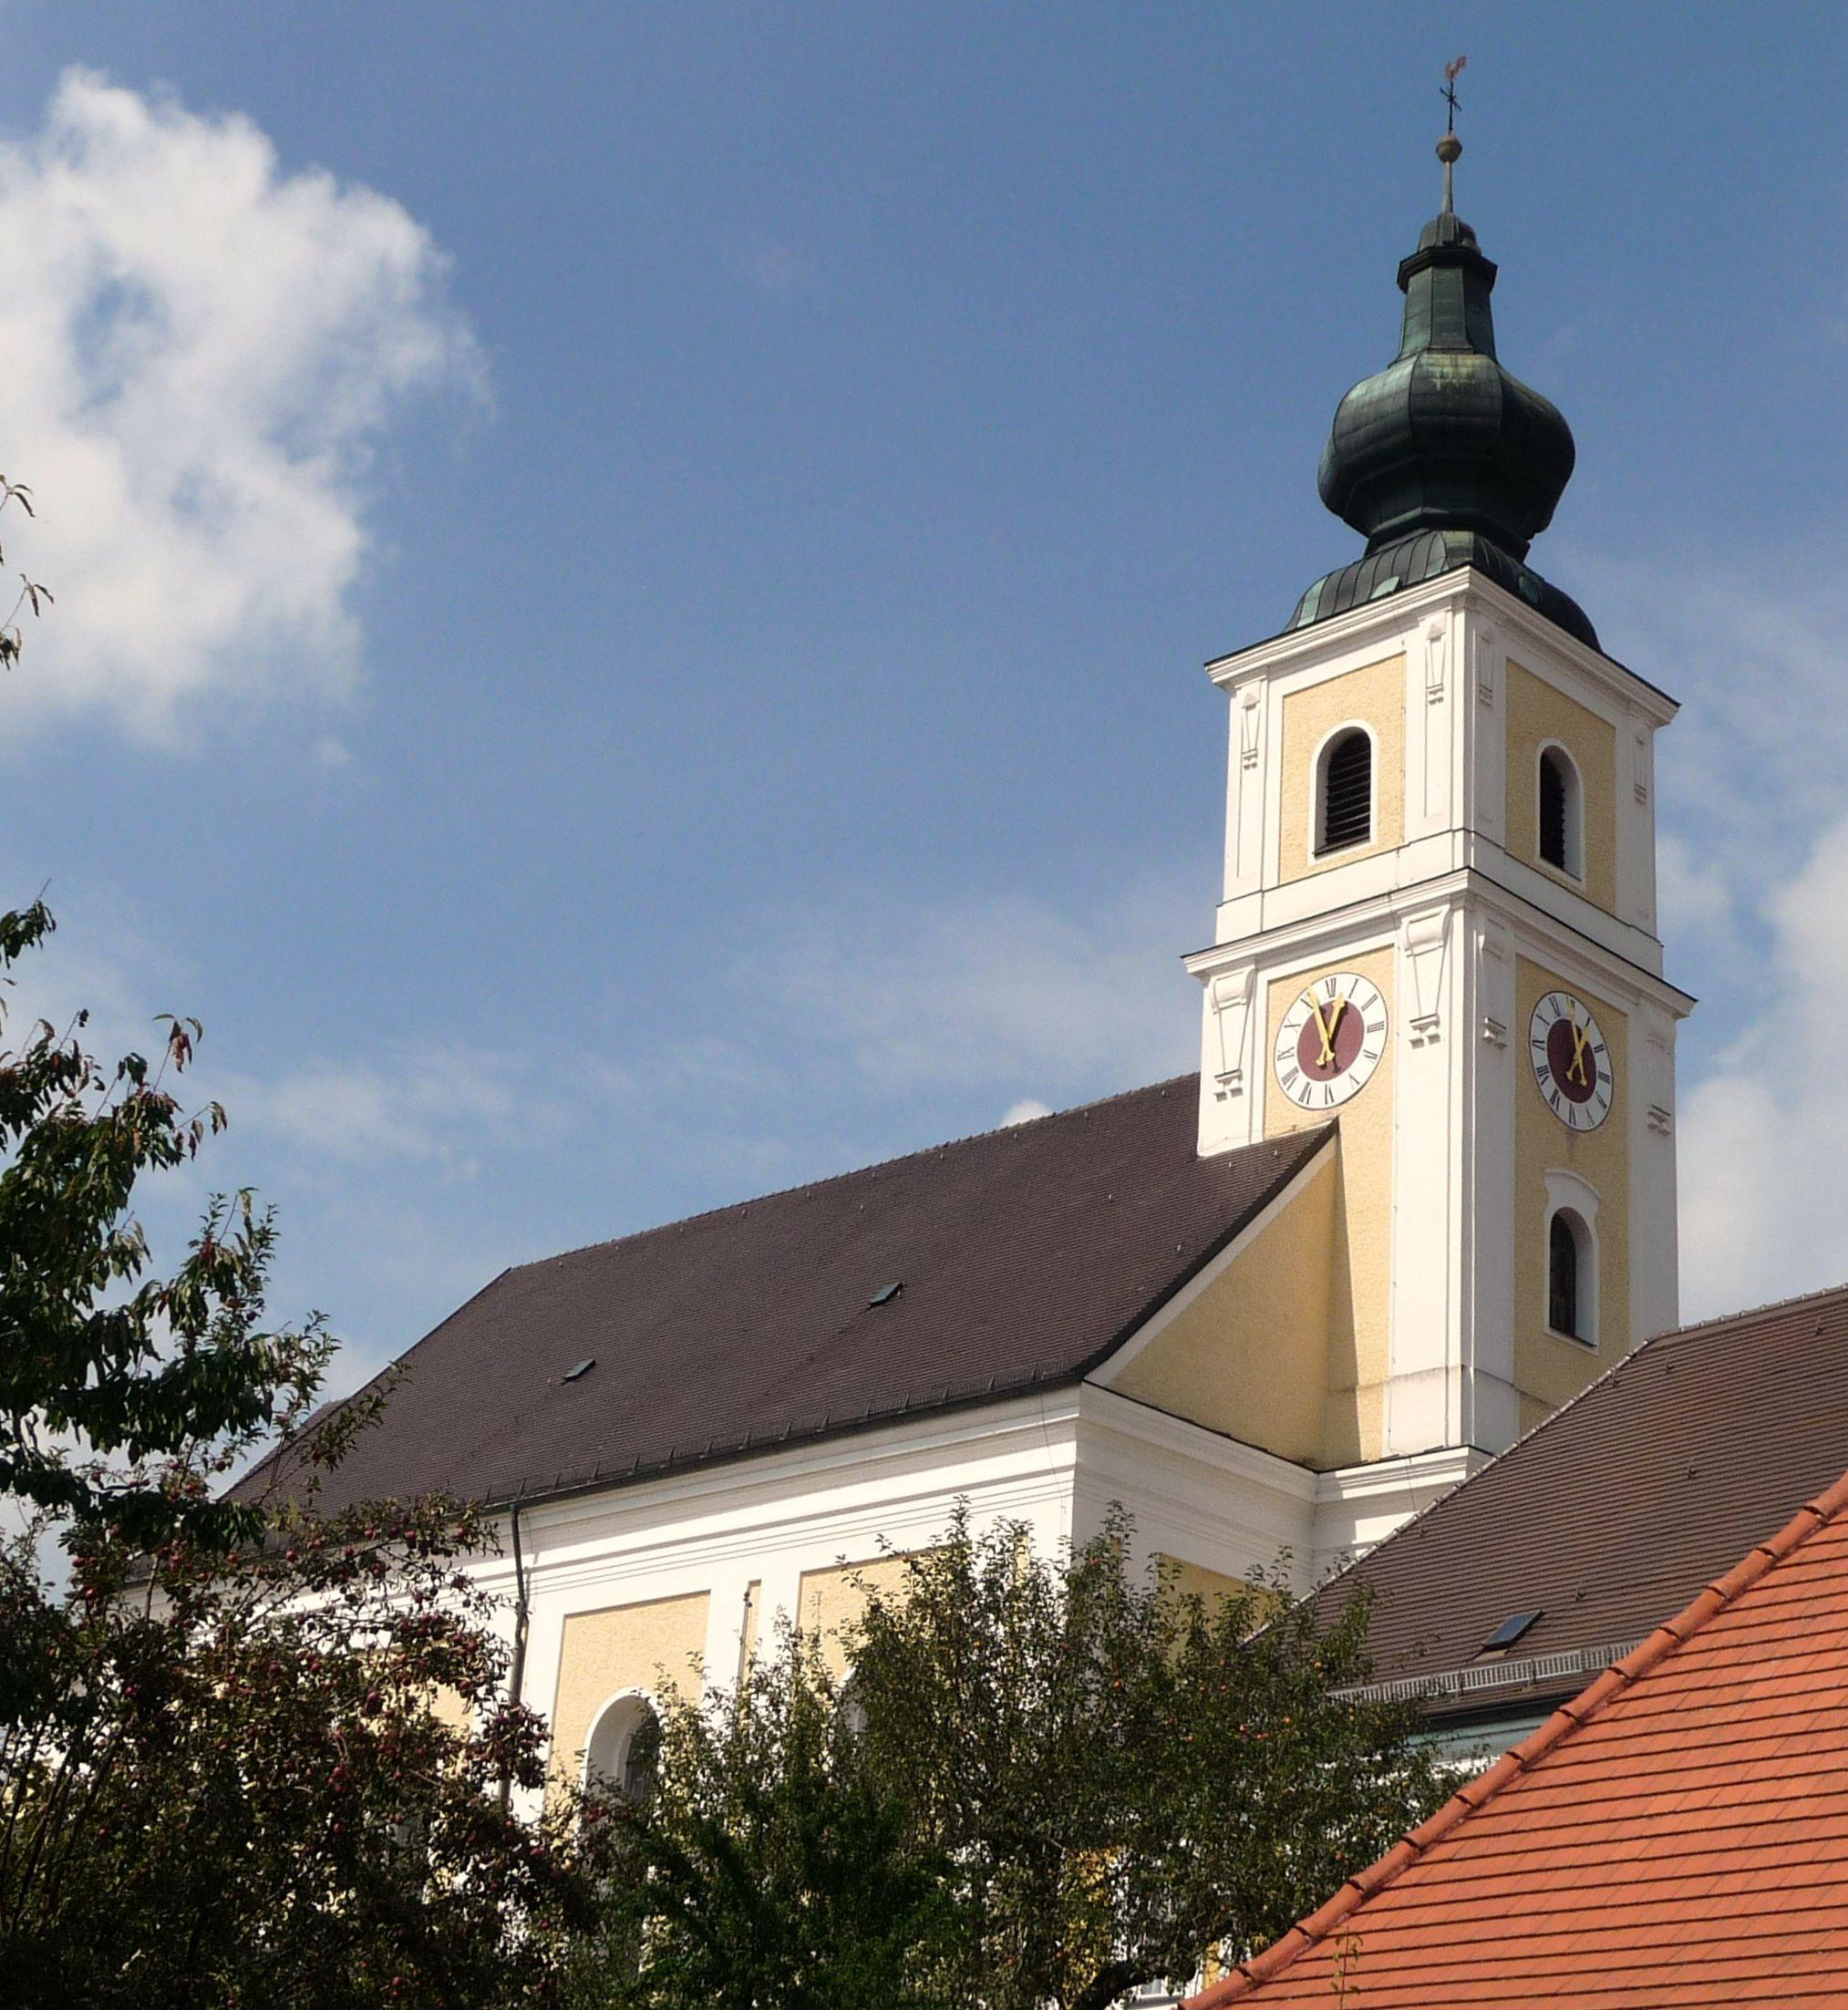 Pfarrkirche Tann